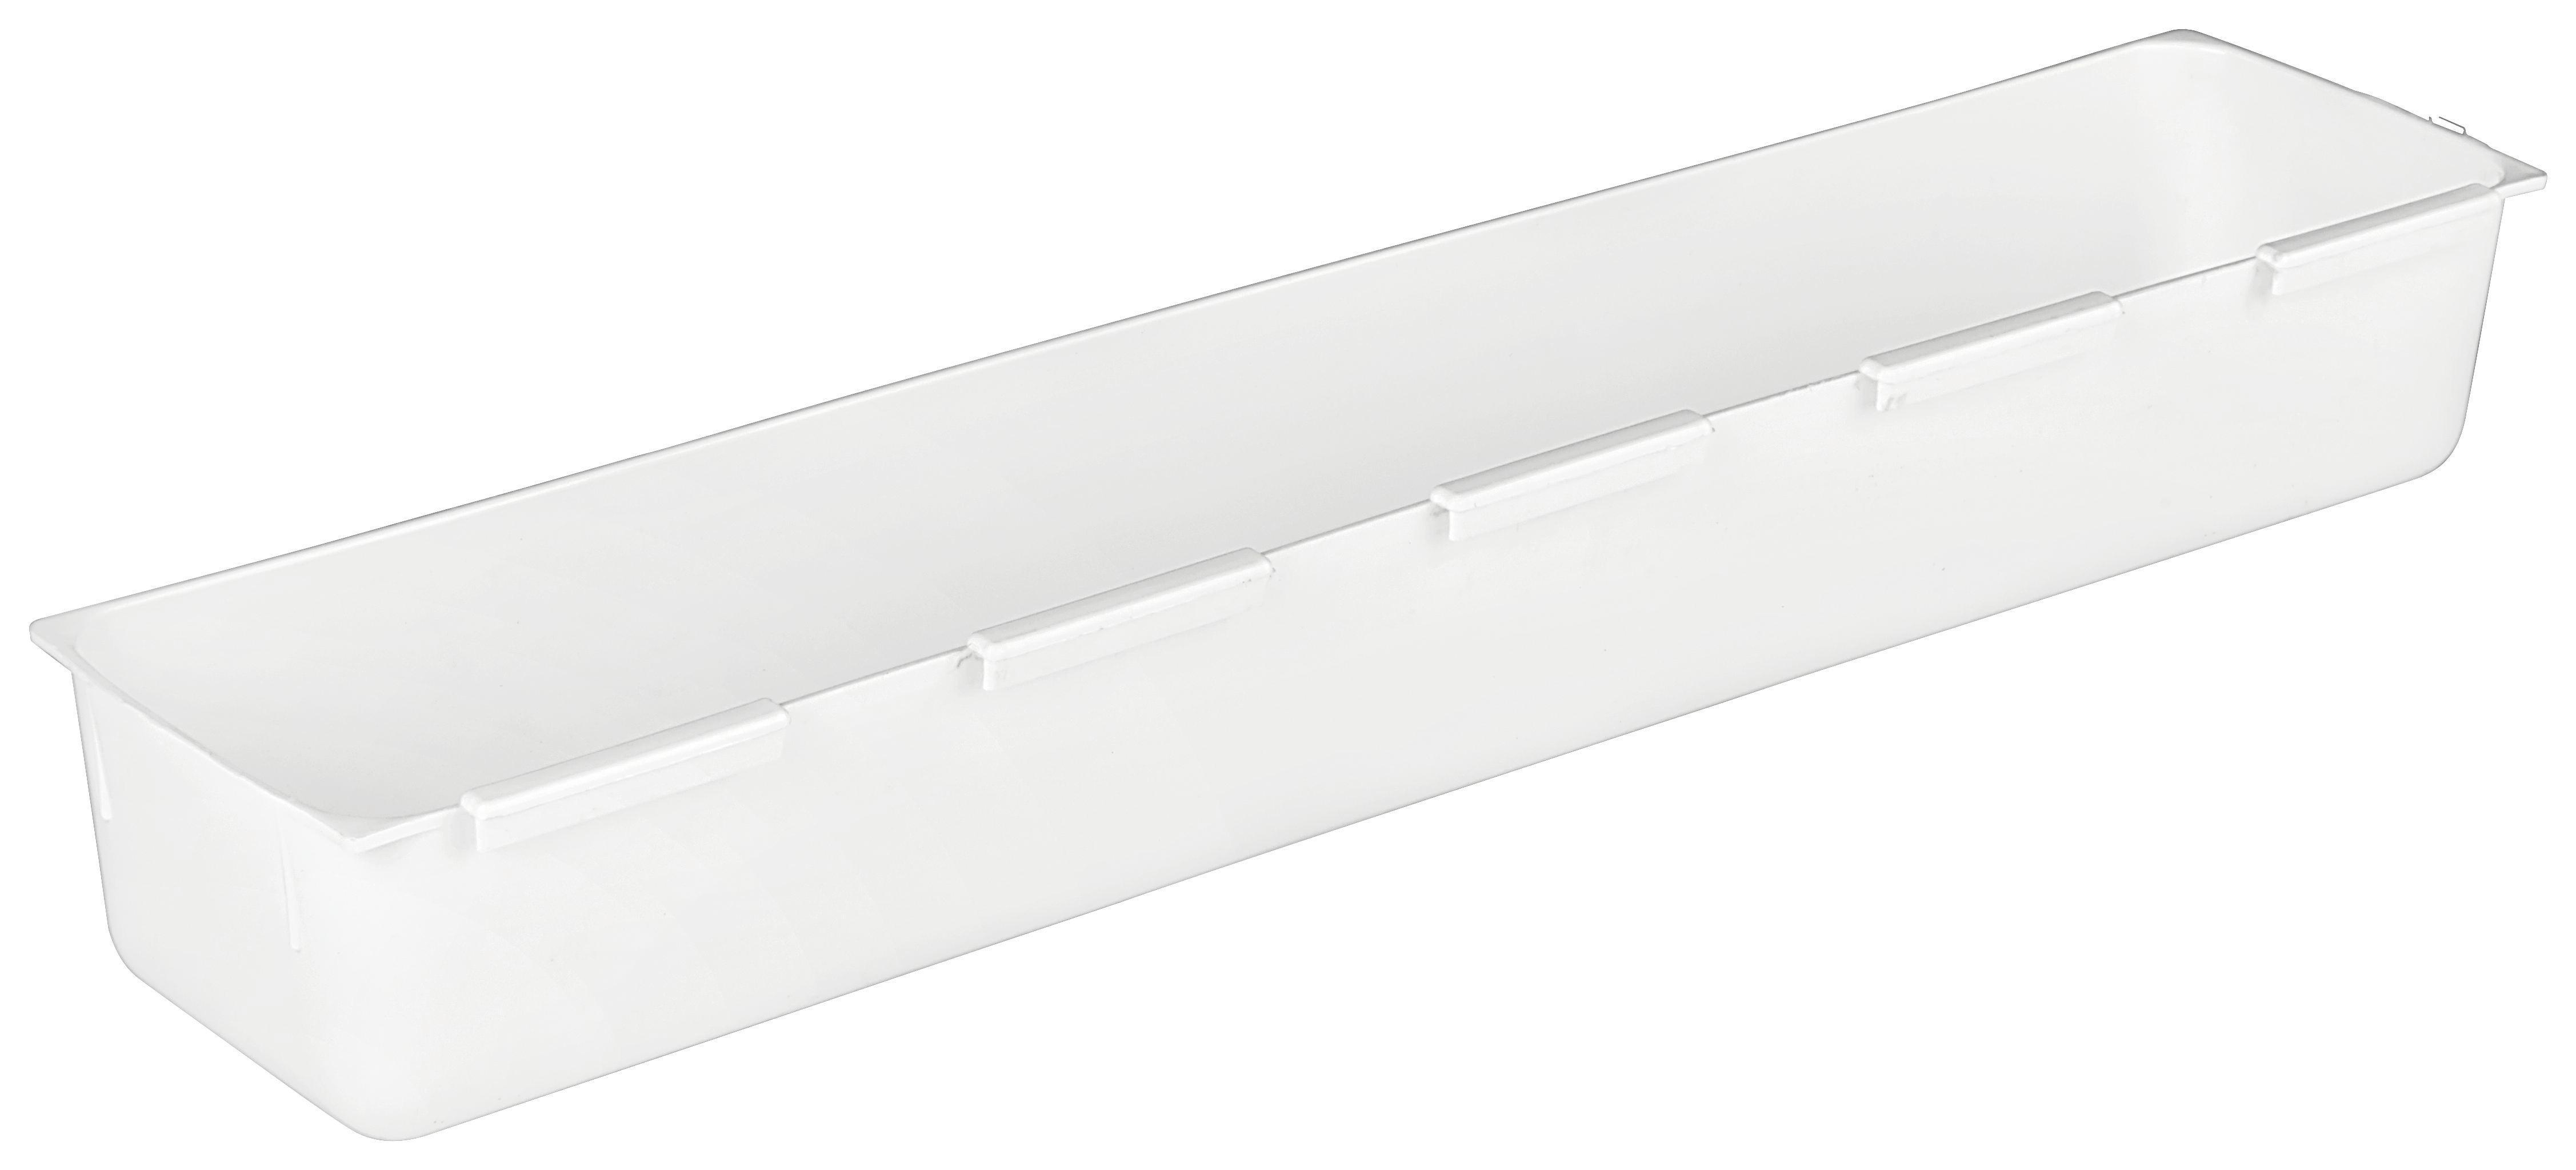 Schubladenbox Wanda in Weiß, ca. 7,5x37,5cm - Weiß, Kunststoff (7,5/37,5cm)